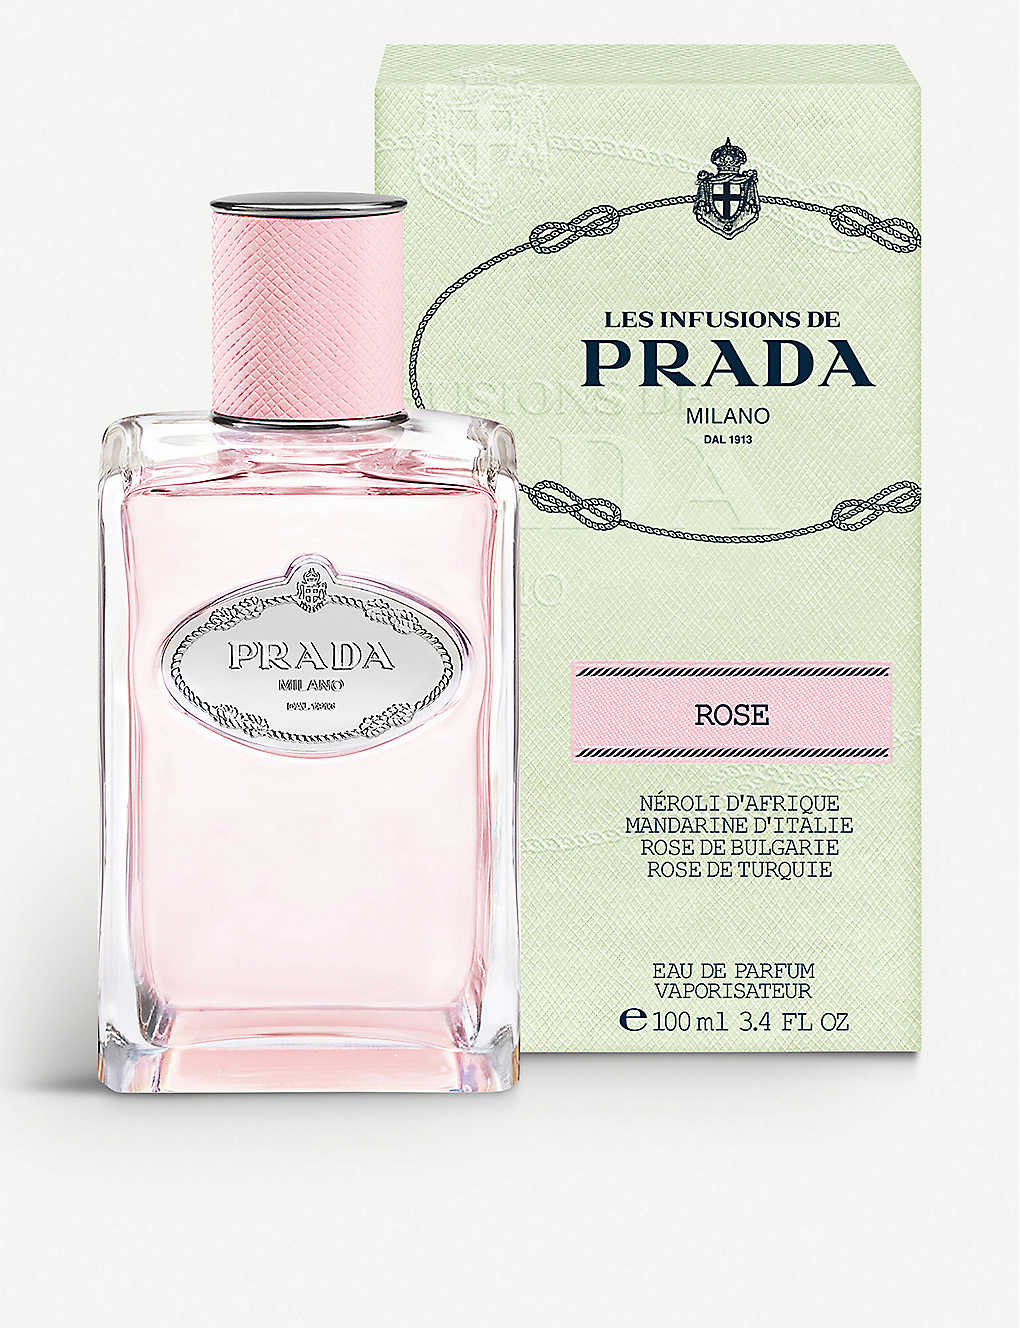 Rose Eau Infusion Parfum 100ml De Prada fgyY7b6